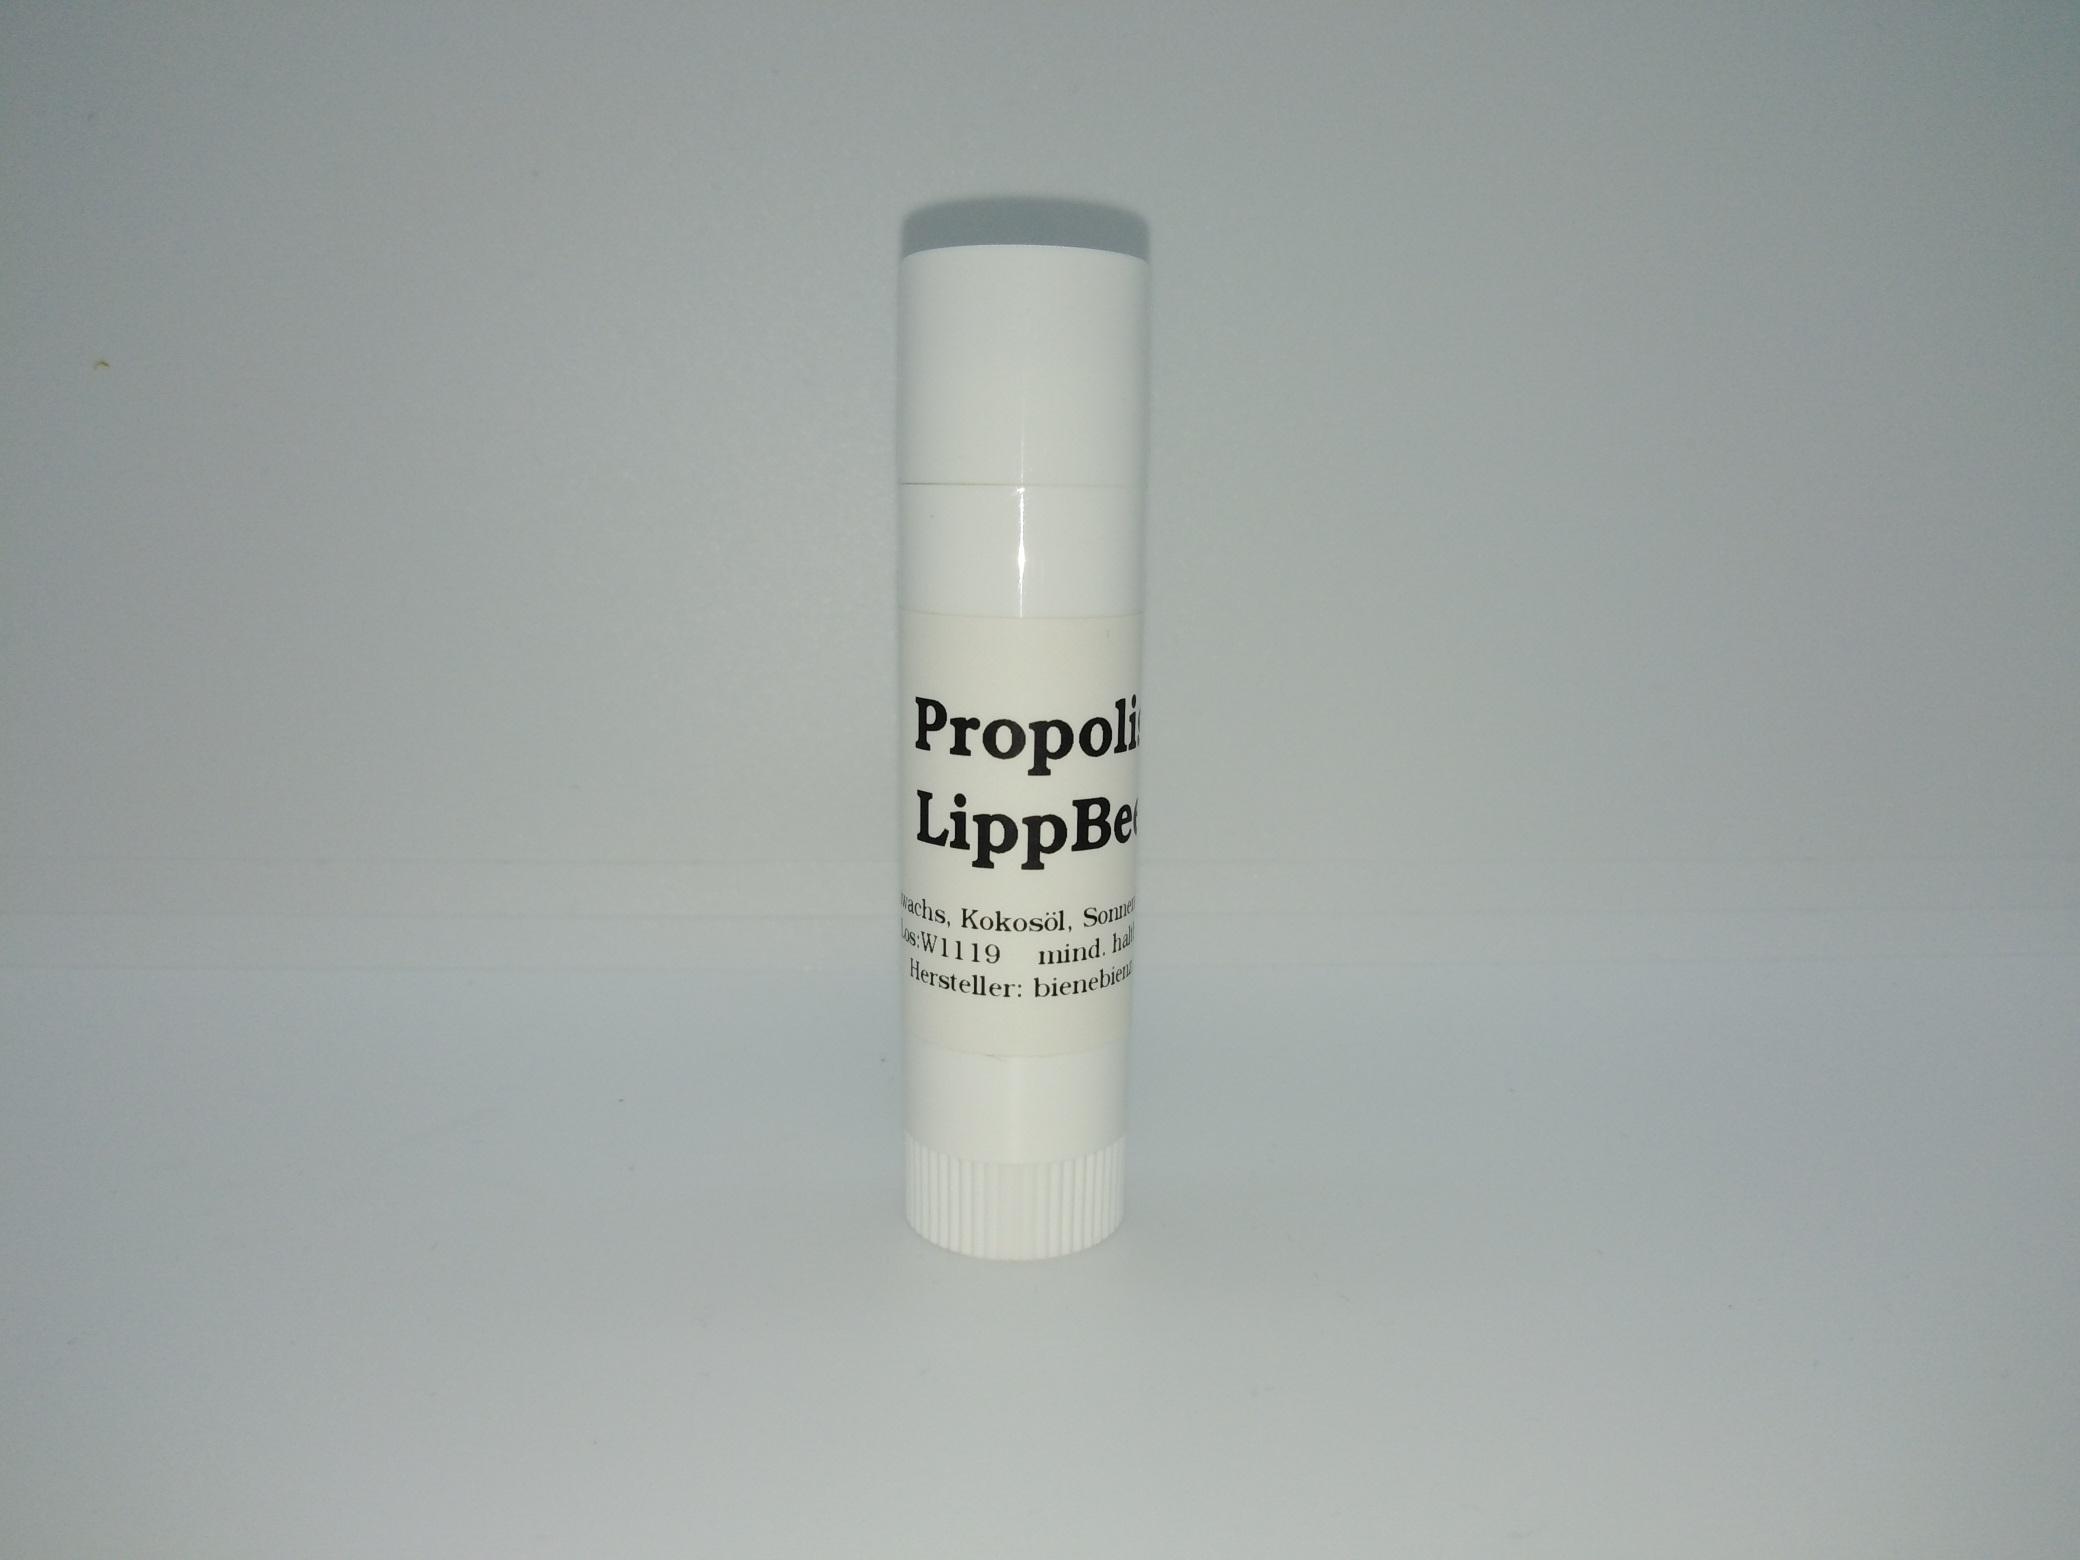 Propolislippbee